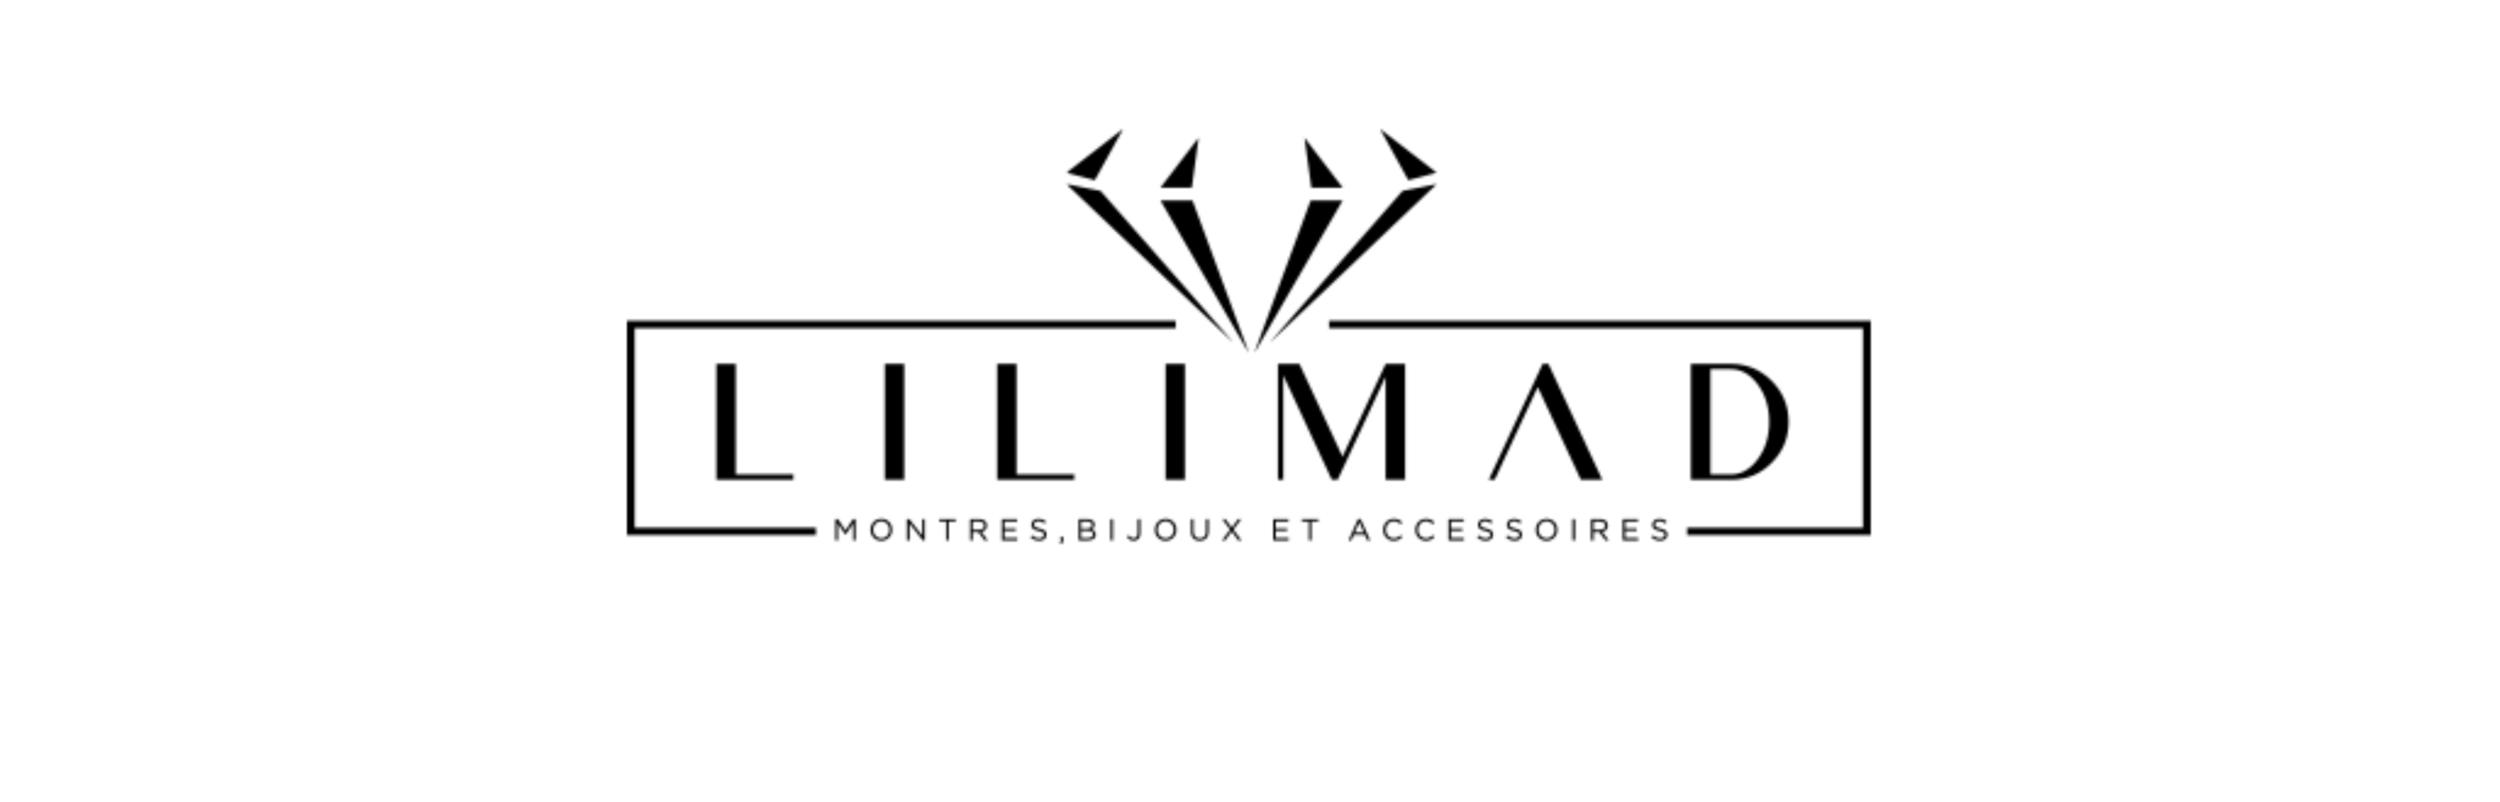 LiliMad